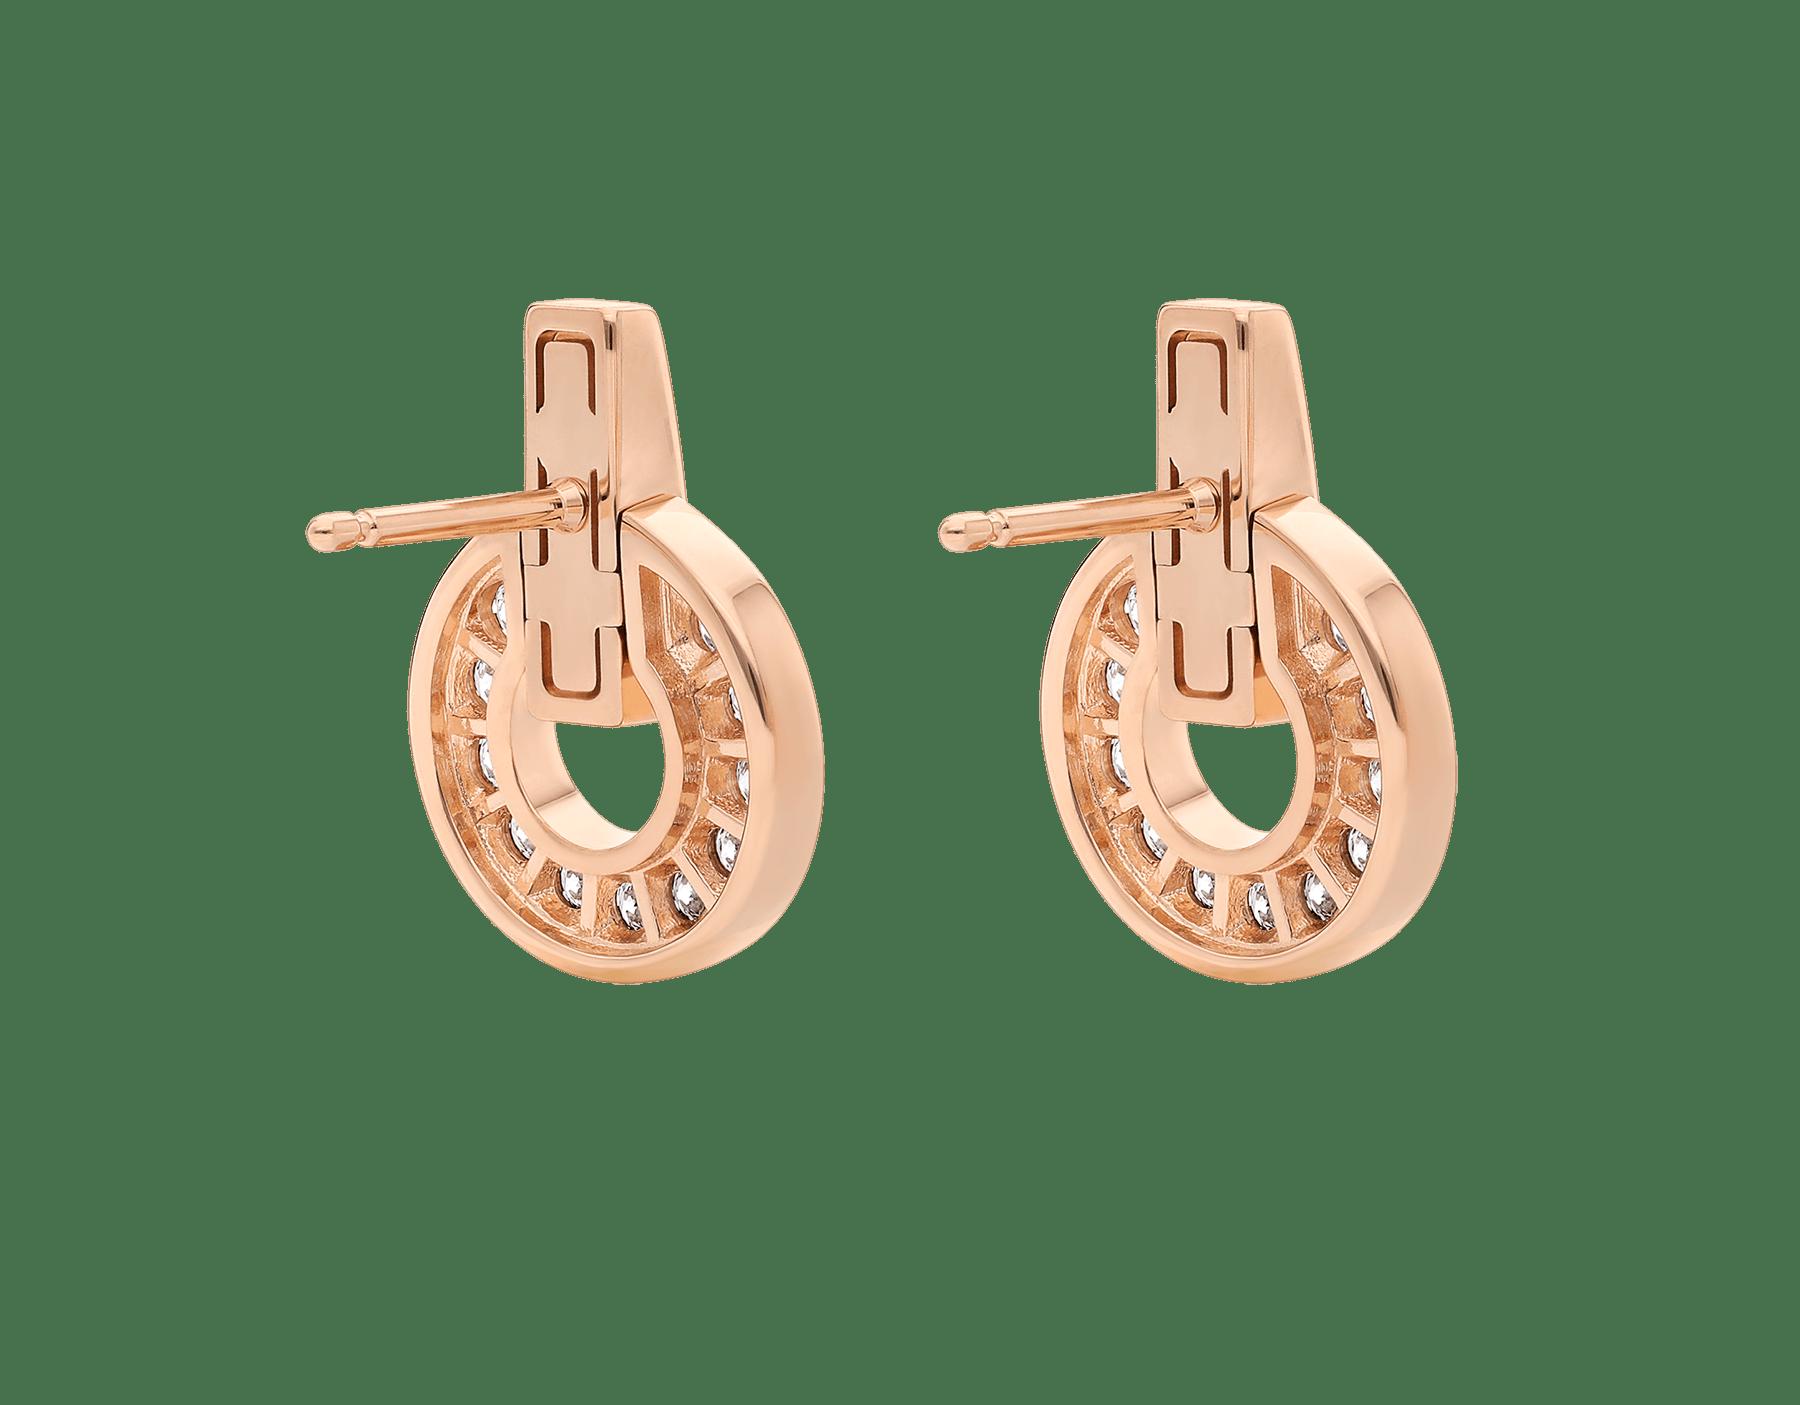 BVLGARI BVLGARI Openwork 18 kt rose gold earrings set with full pavé diamonds 357318 image 3